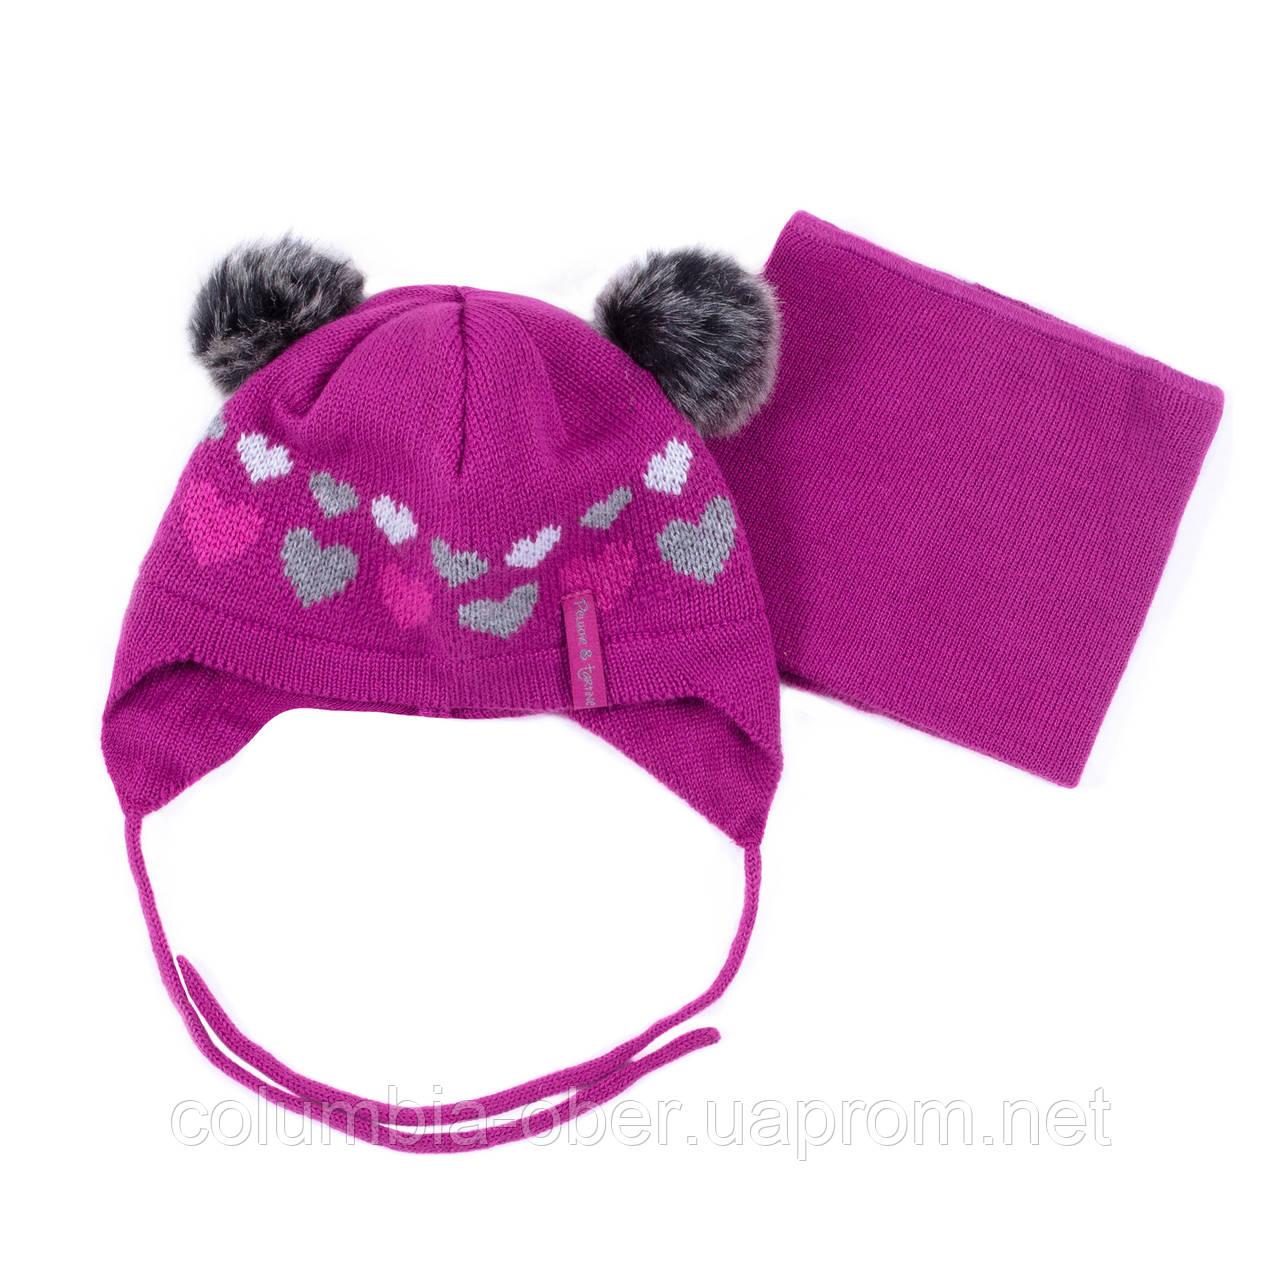 Зимняя шапка+манишка для девочки PELUCHE F19ACC02BF BatonRouge. Размеры 6/12 мес - 2/3 года .